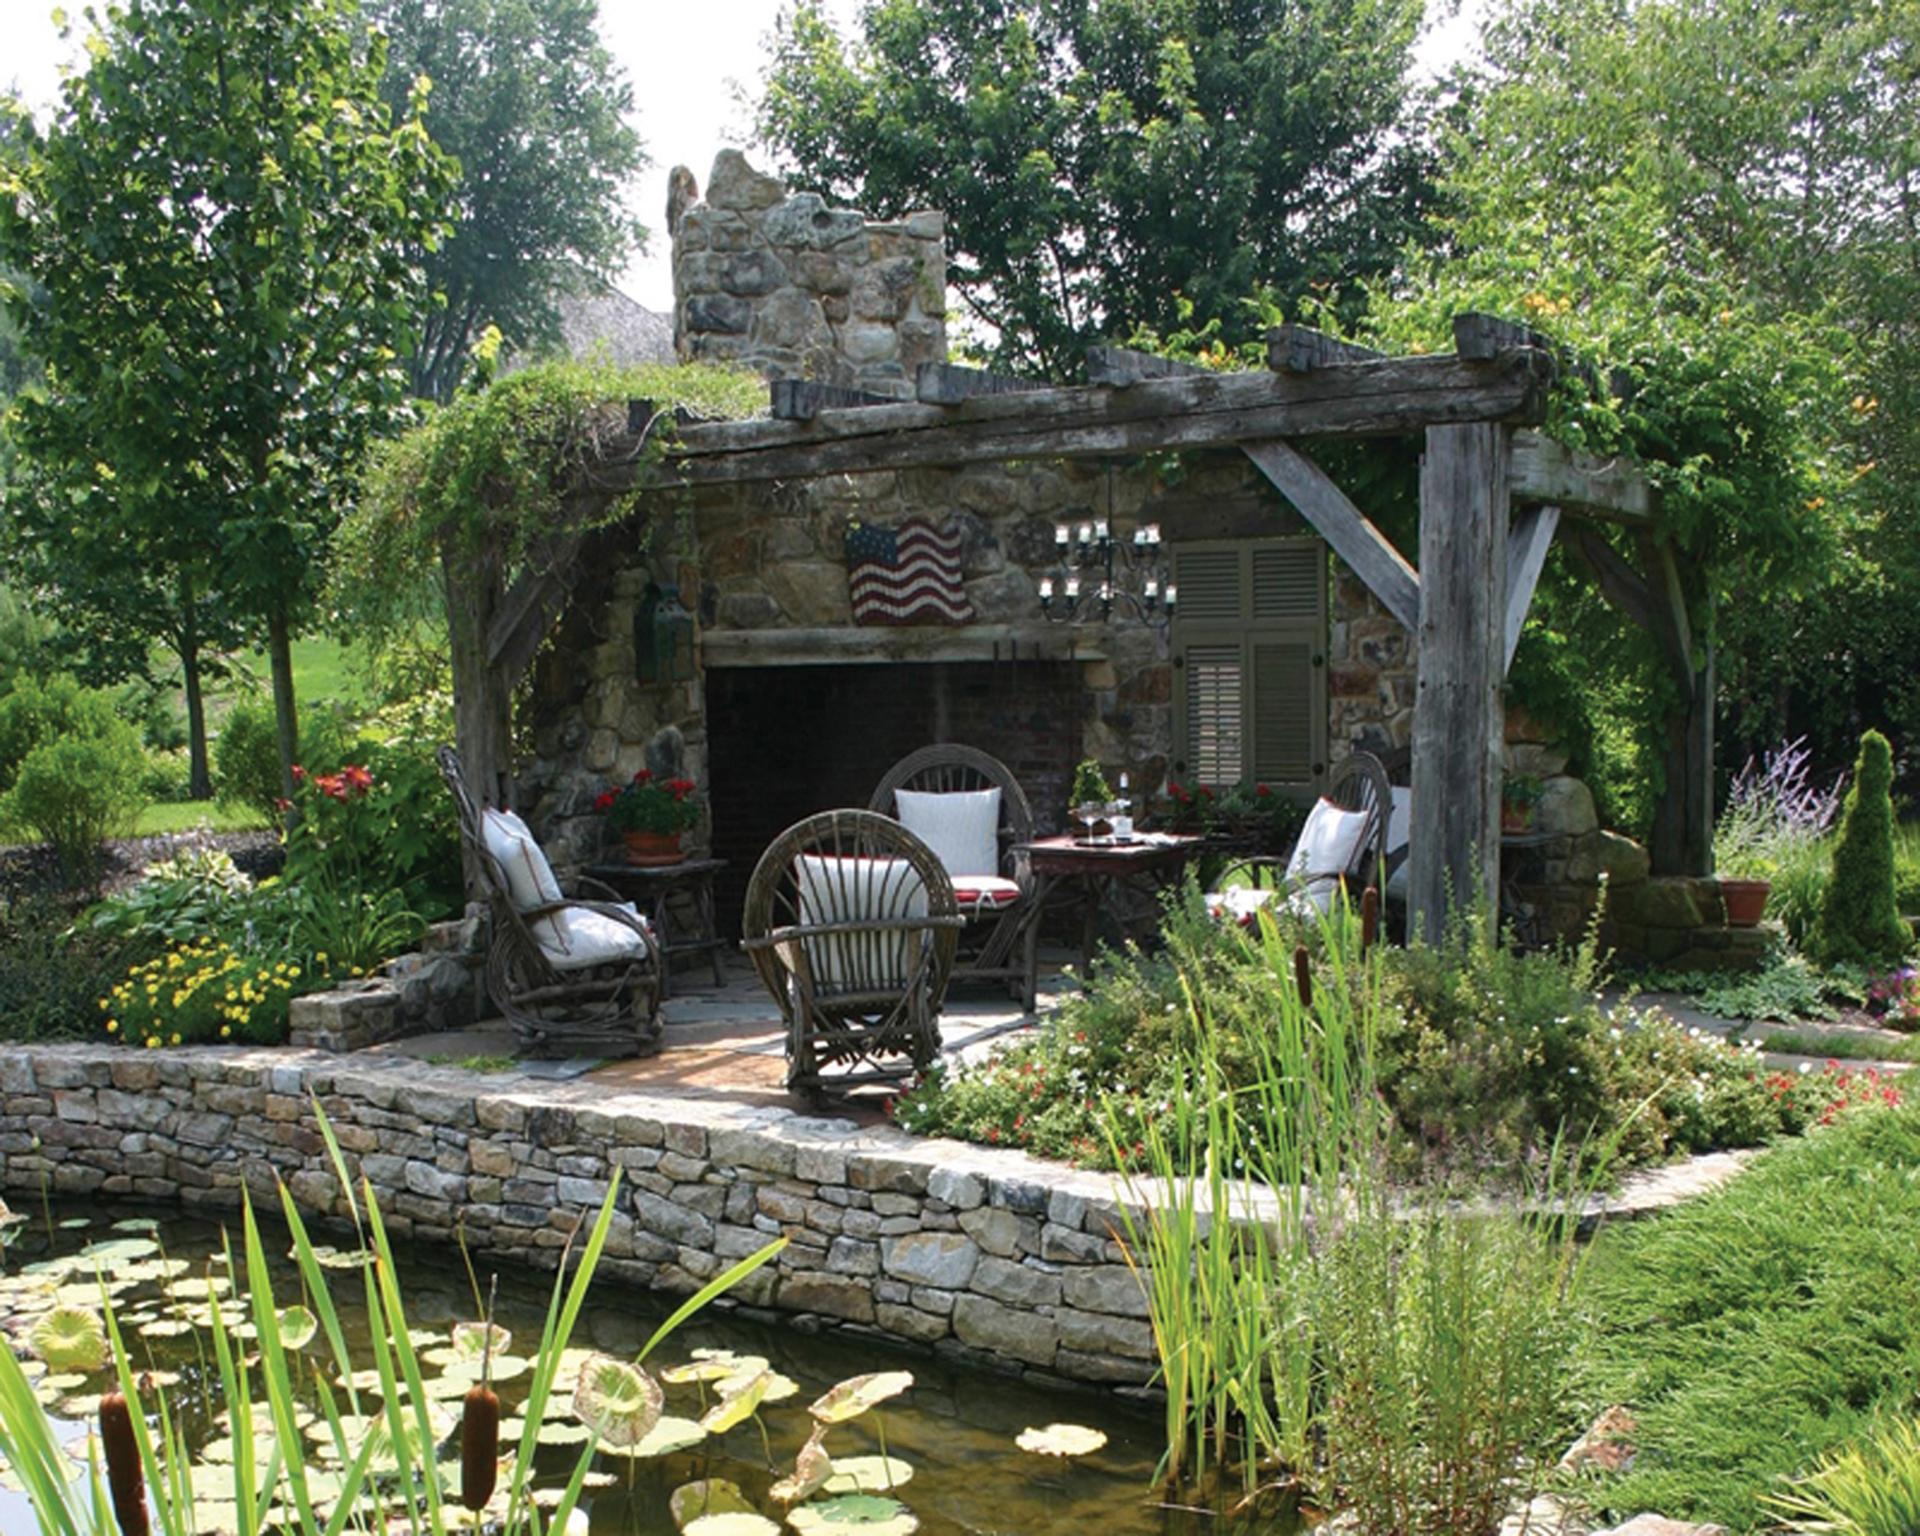 stone-fireplace-outdoor-room-berwyn-pa-main-line-pa